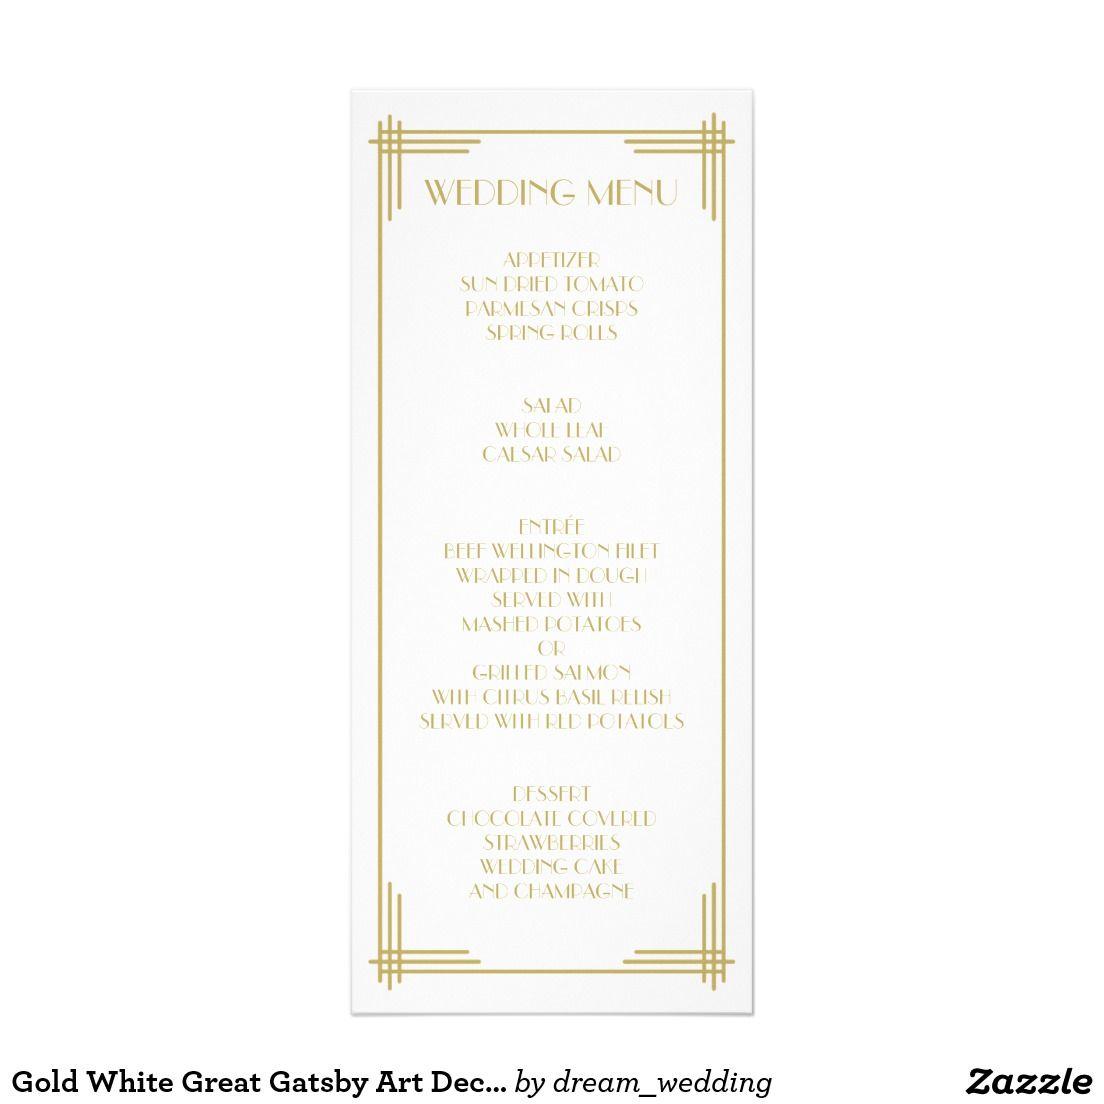 Gold White Great Gatsby Art Deco Wedding Menu | Zazzle.com in 2020 | Art  deco wedding, Wedding menu cards, Wedding menu